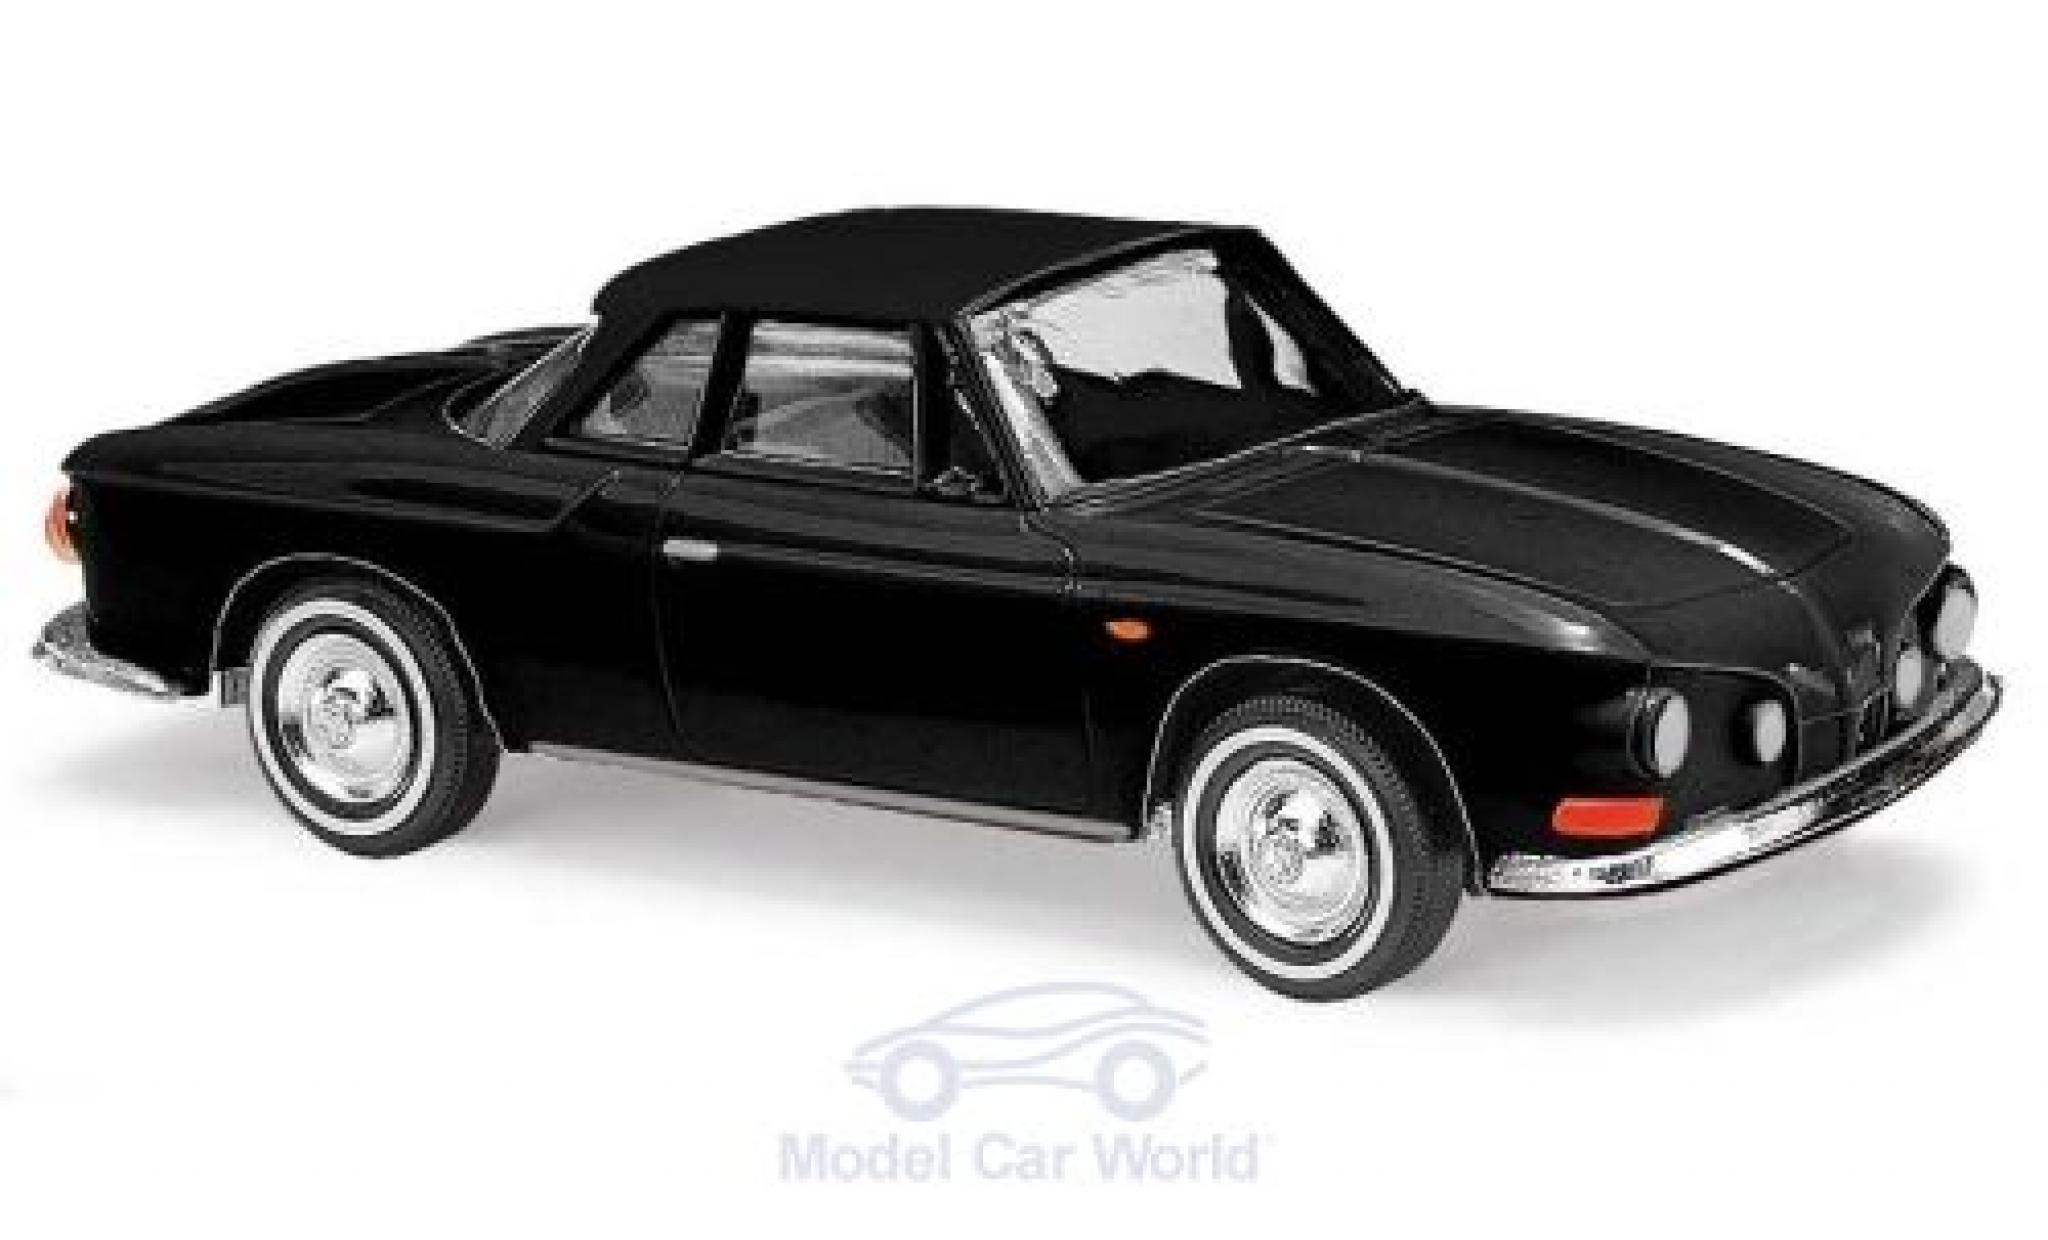 Volkswagen Karmann 1/87 Busch Ghia 1600 black 1961